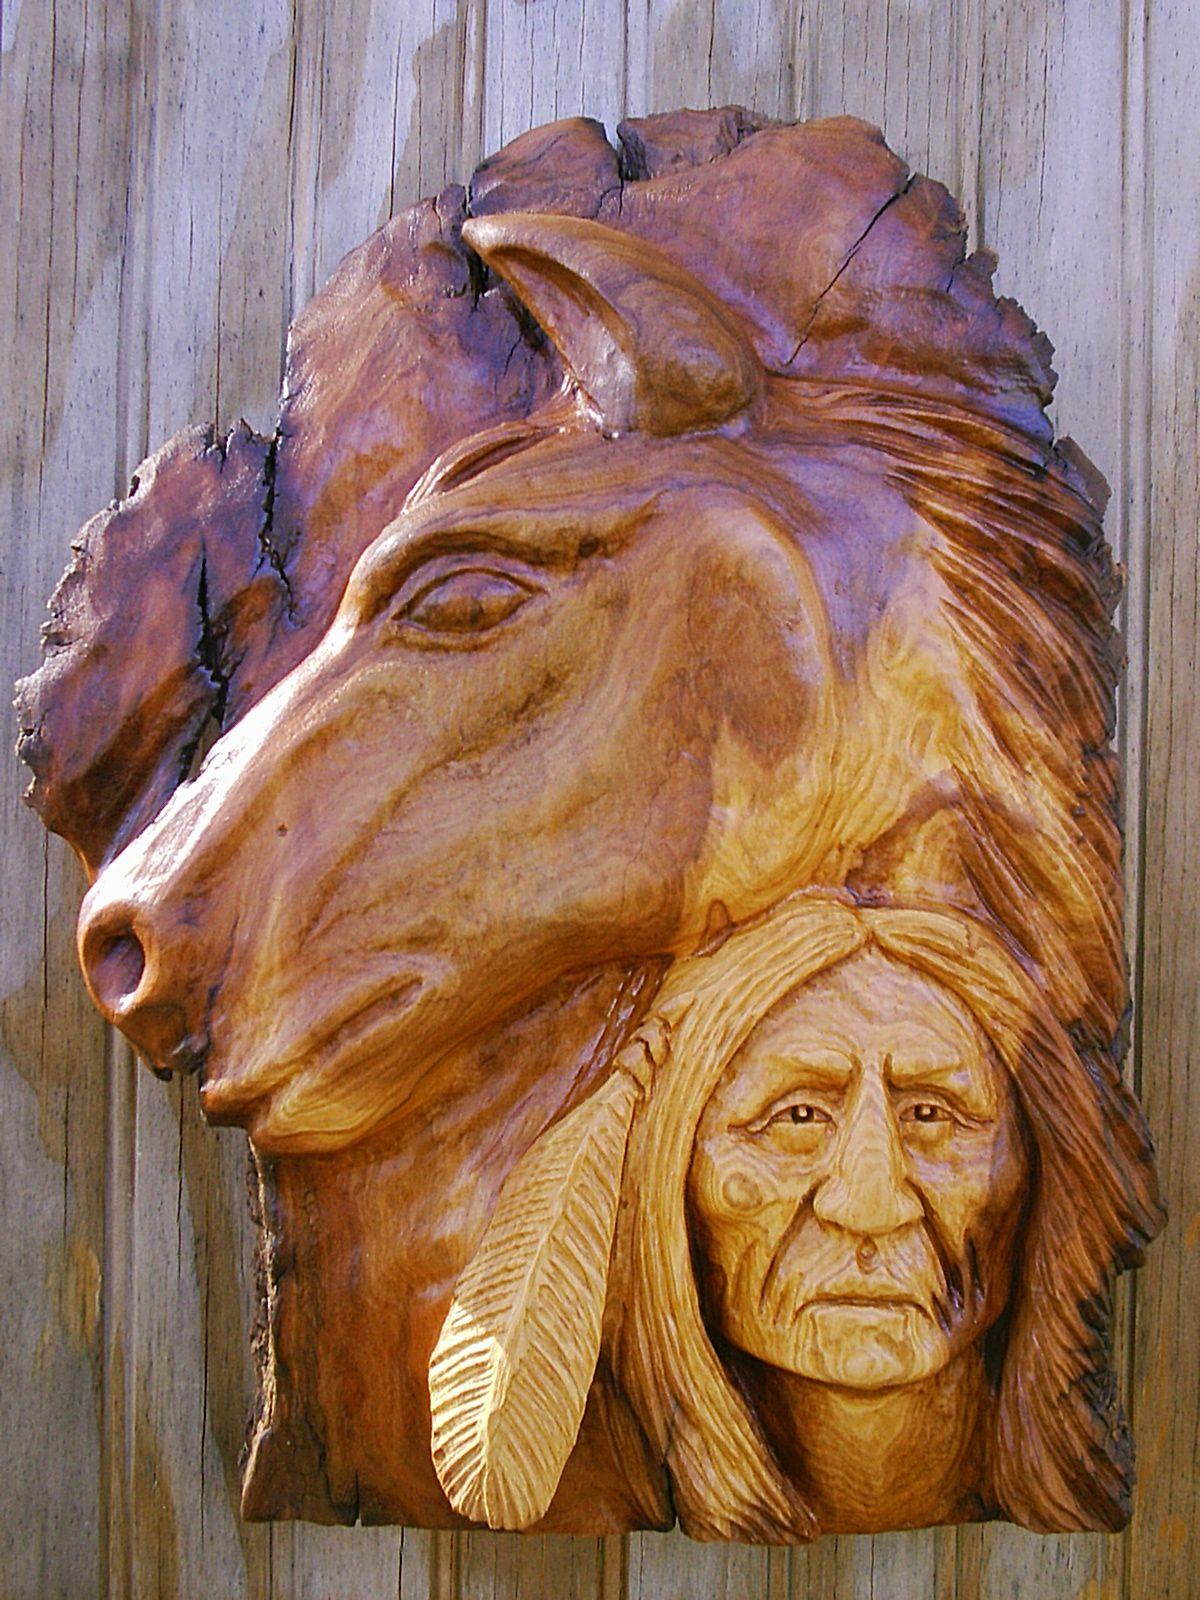 Image gallery indian wood carvings